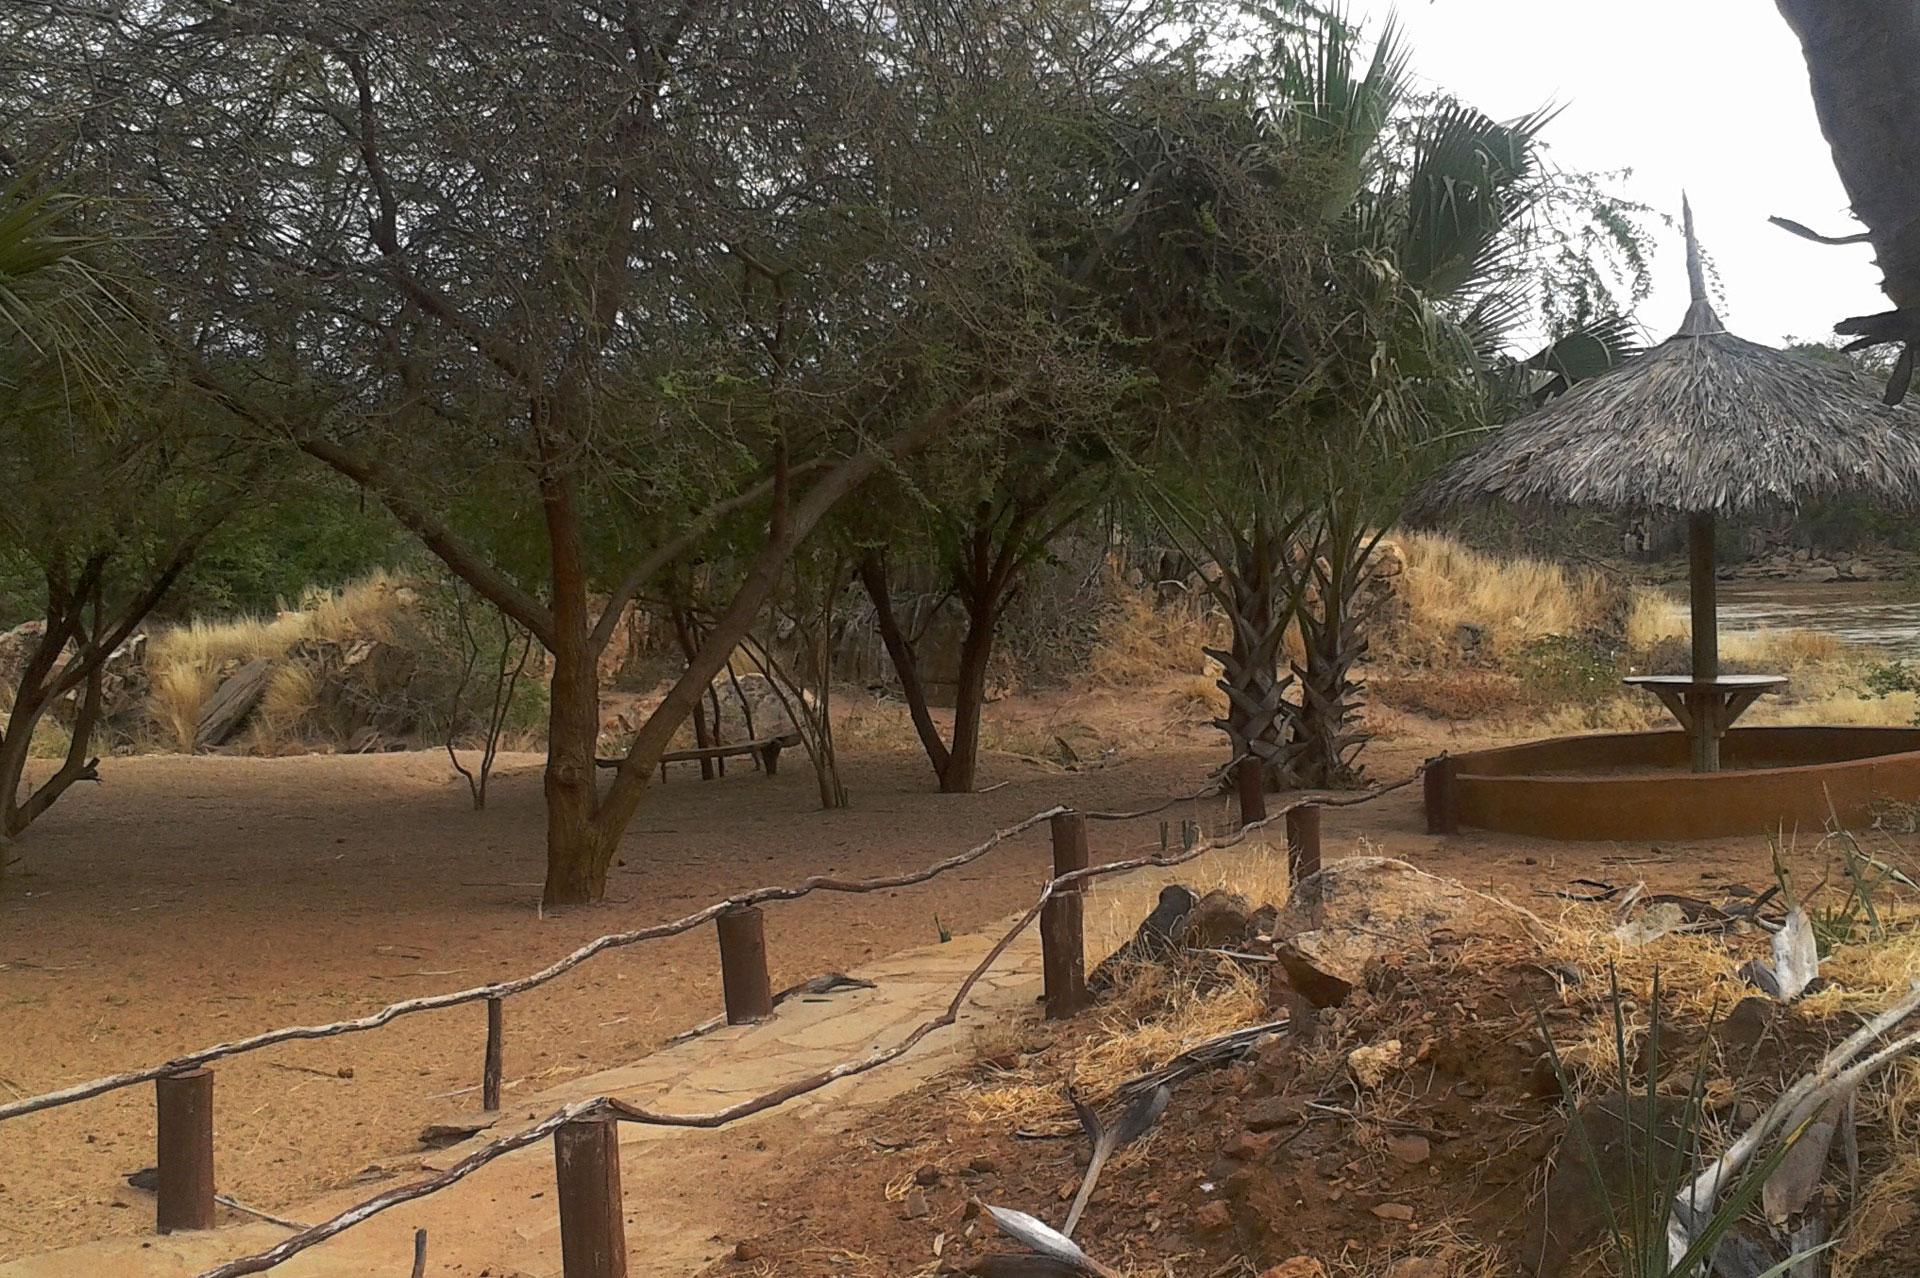 Diani_travel_center_National_Parks_in_Kenya_Mwingi_Reserve_image_2